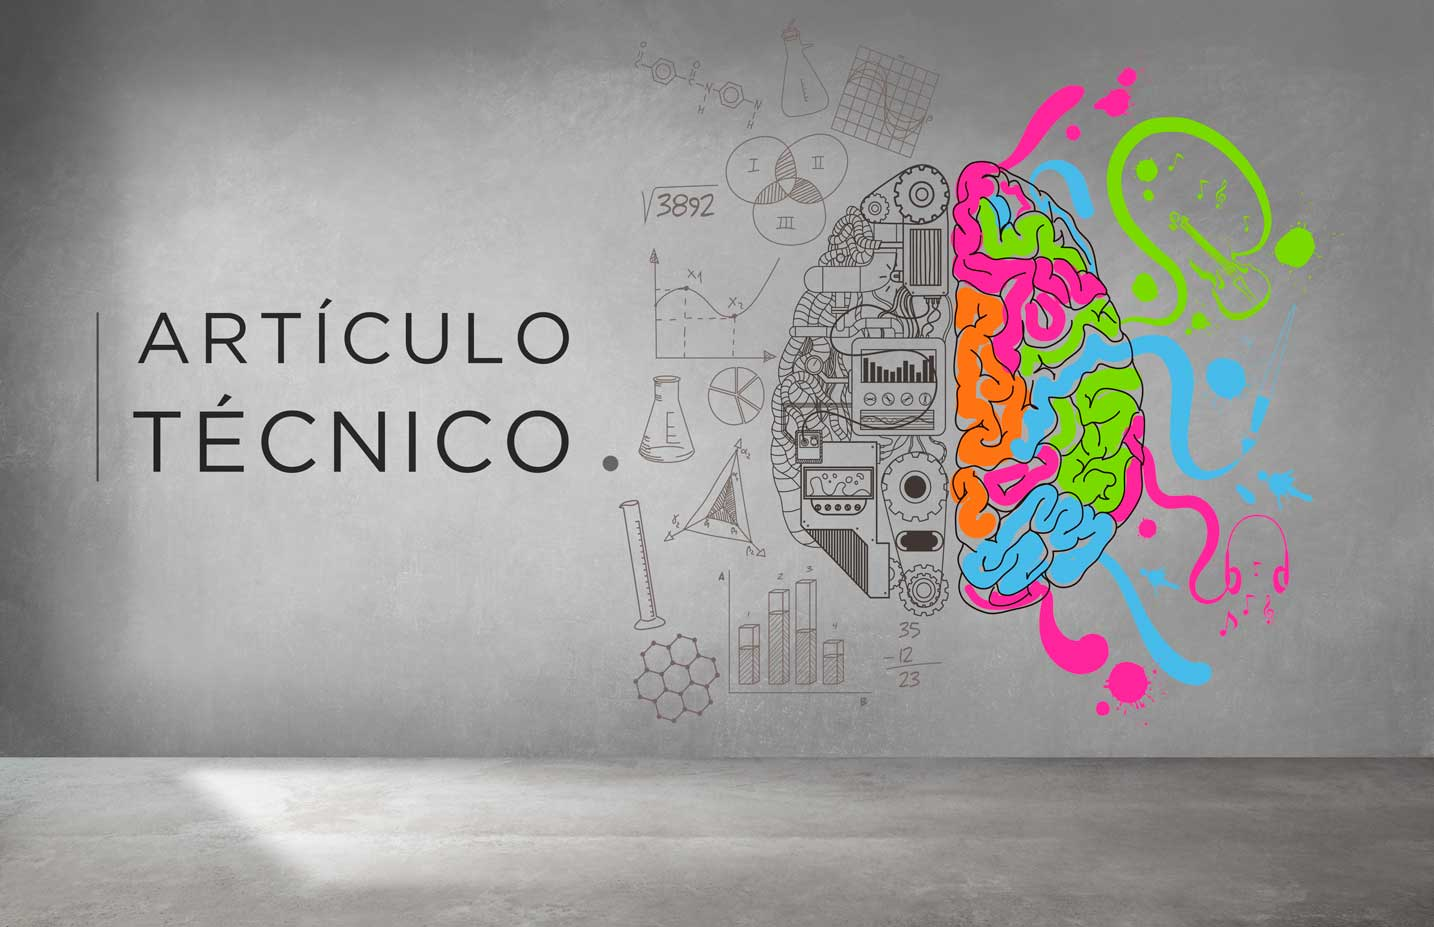 GA-articulo-tecnico-banner